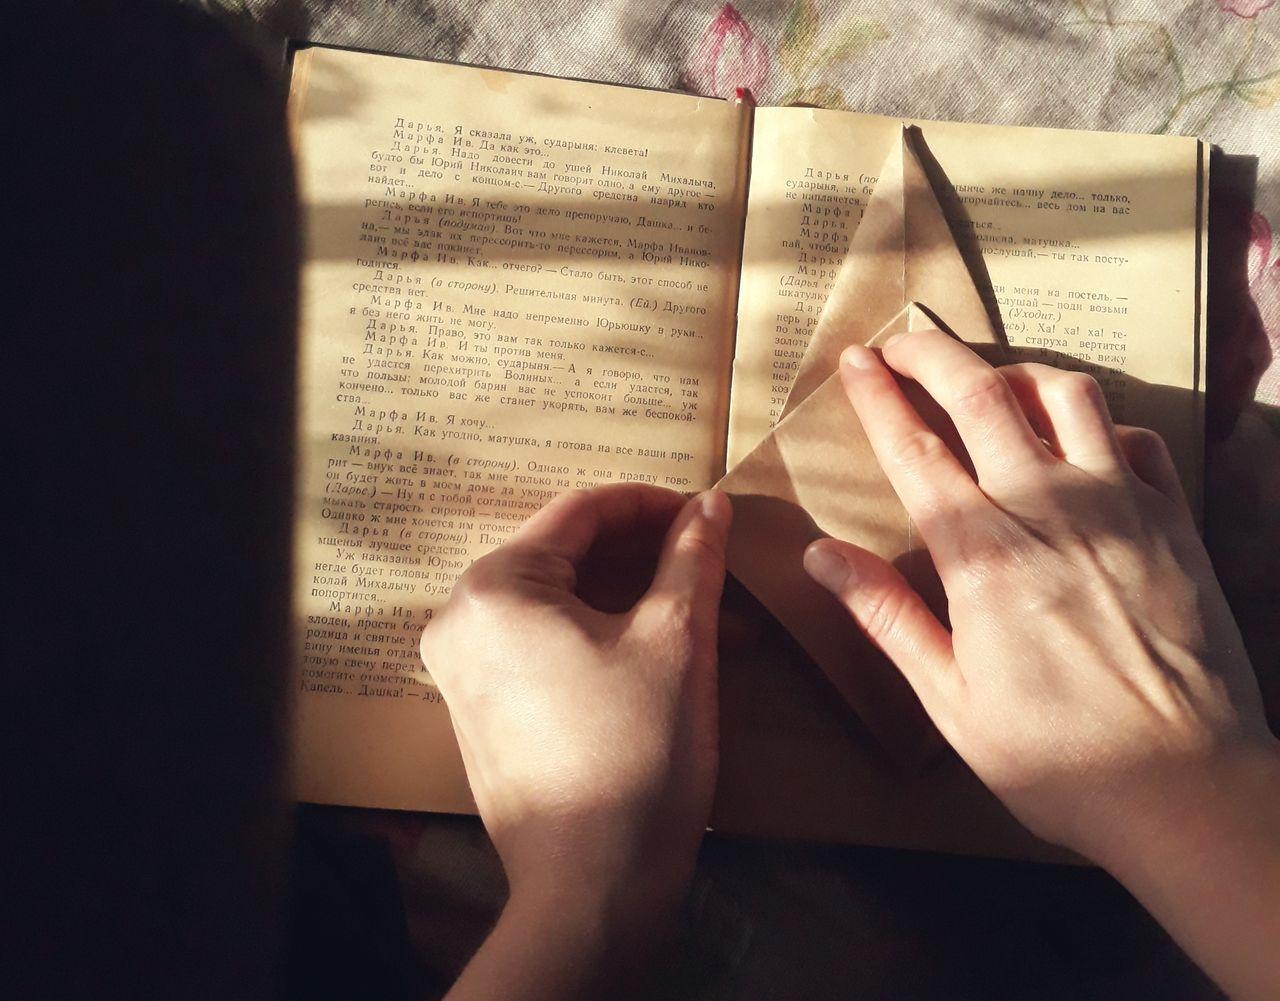 HIGH ANGLE VIEW OF WOMAN HAND ON BOOK